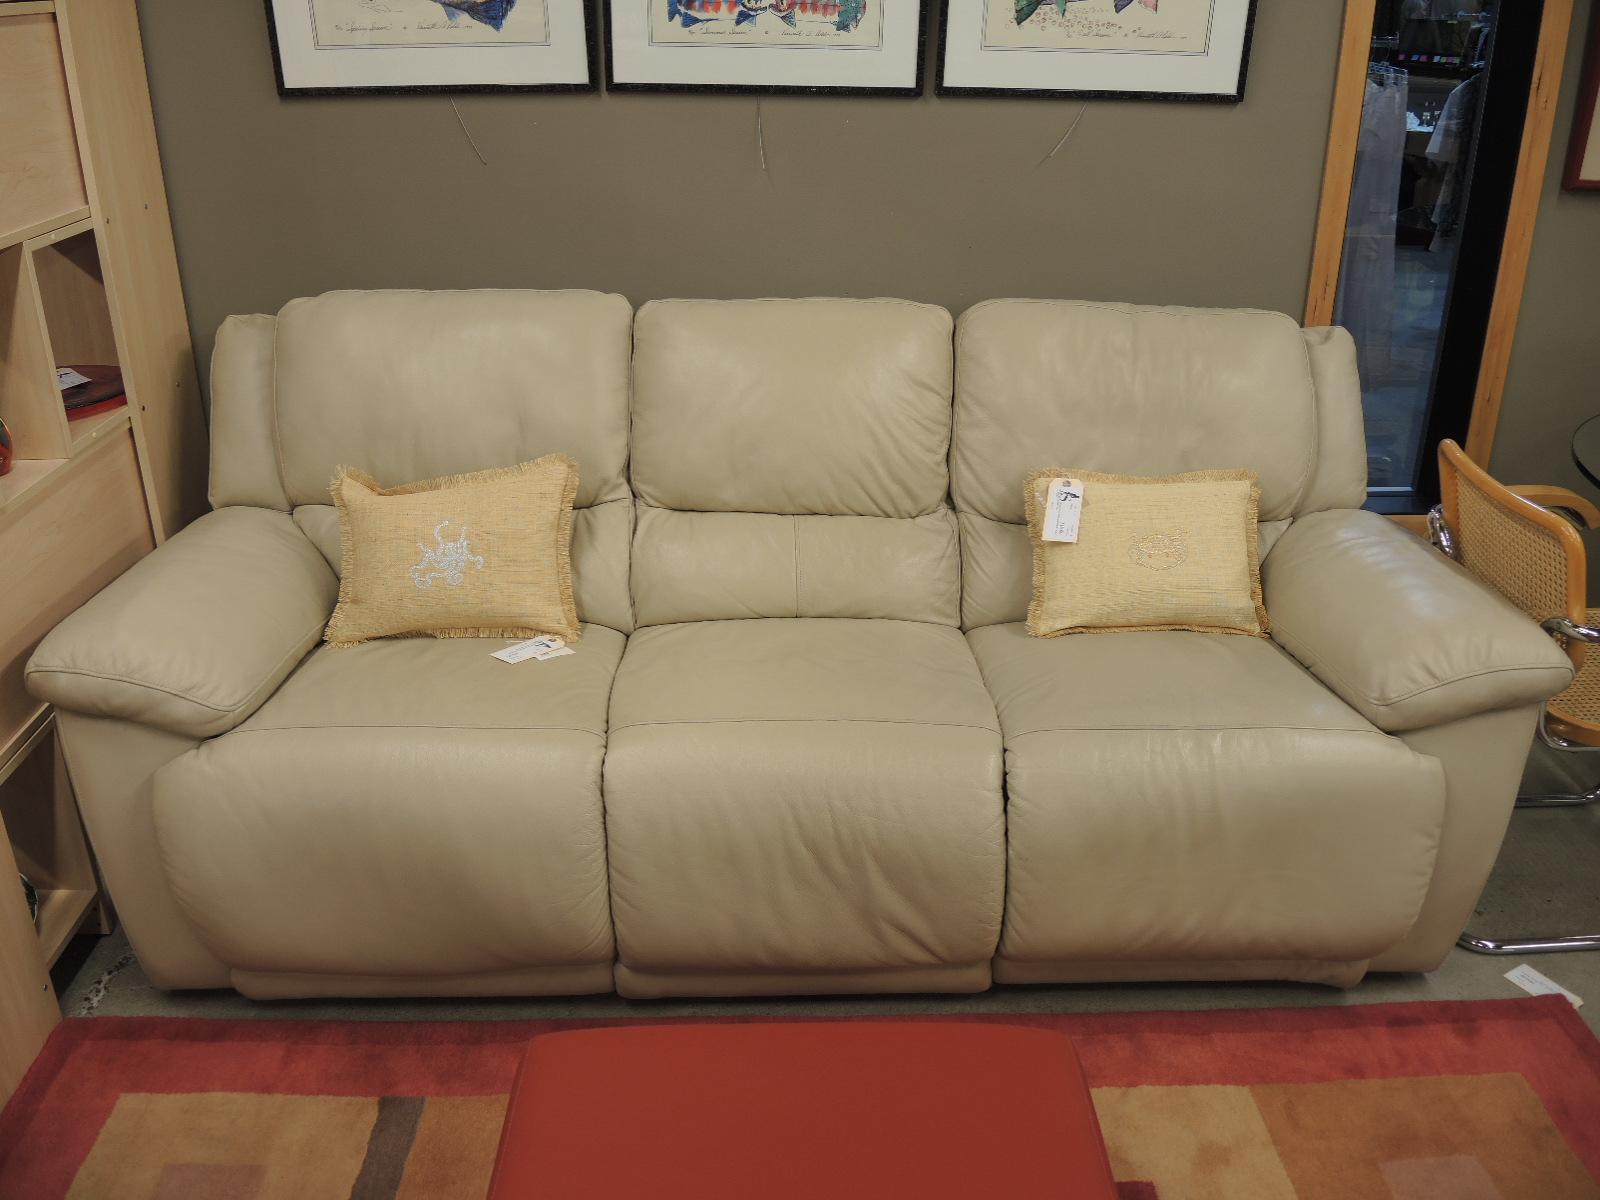 Saarinen Seams To Fit Home - Media room sofa